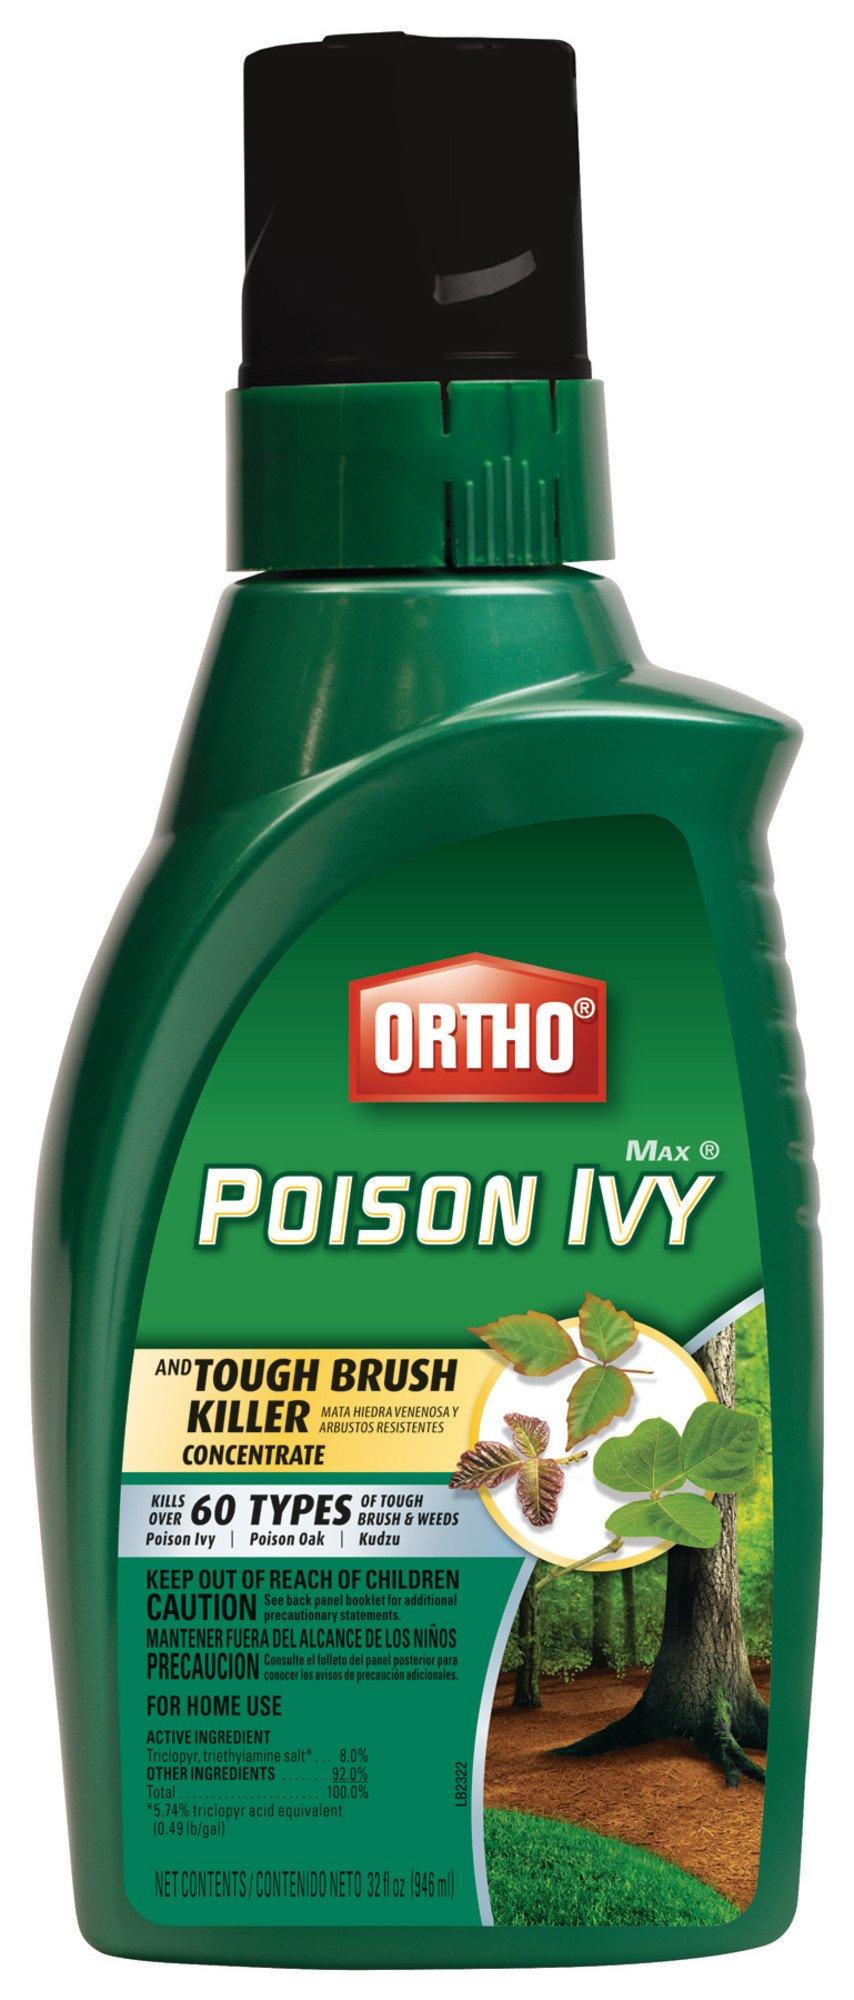 Ortho MAX Poison Ivy And Tough Brush Killer 32 Oz